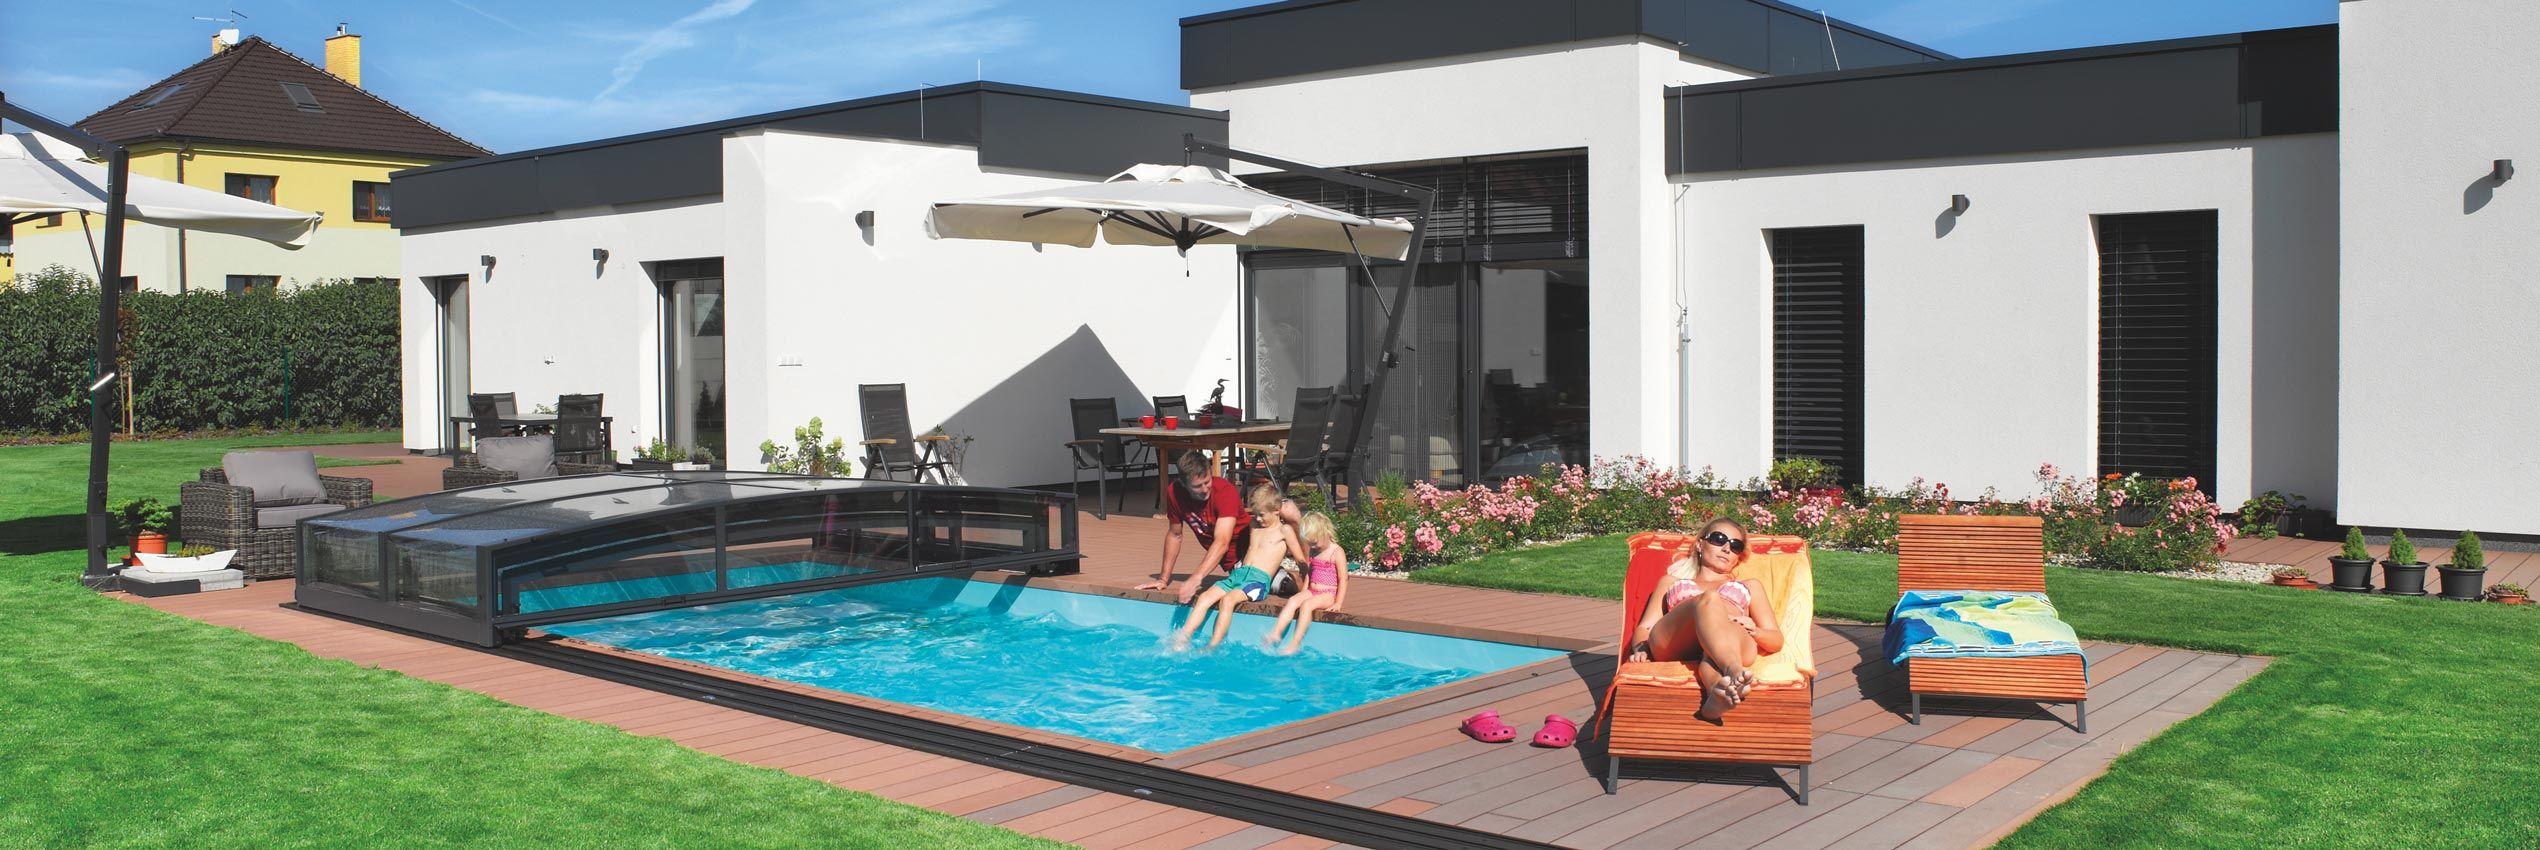 Copertura piscina aperta a metà Viva